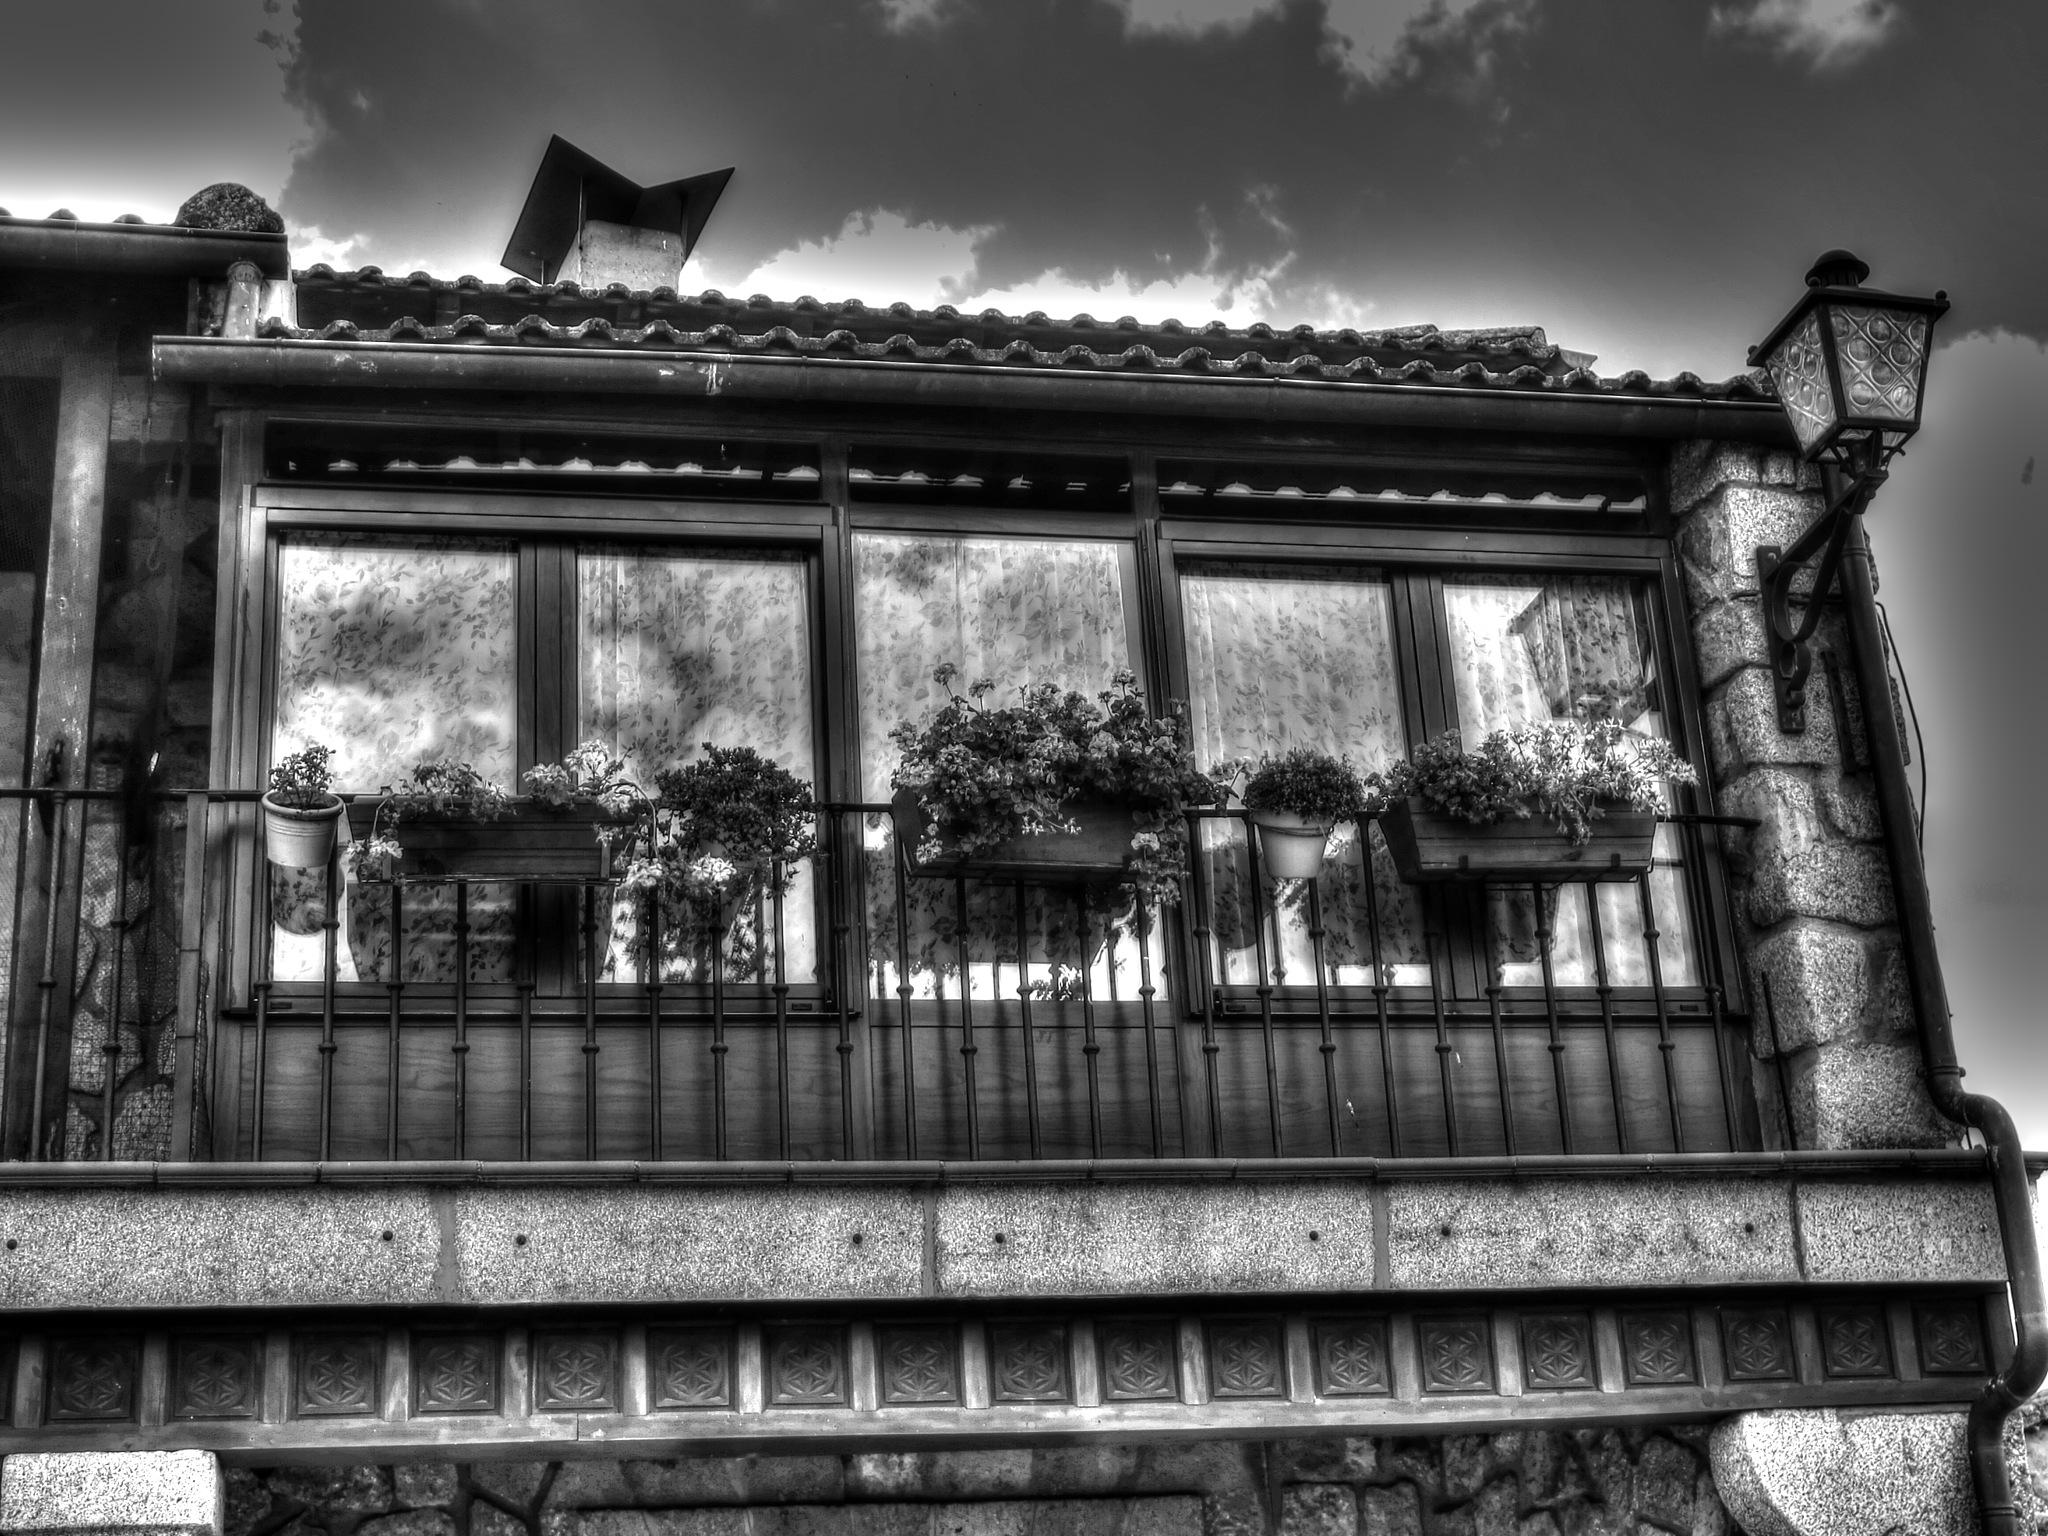 In Old Ledesma #11 by SteveR